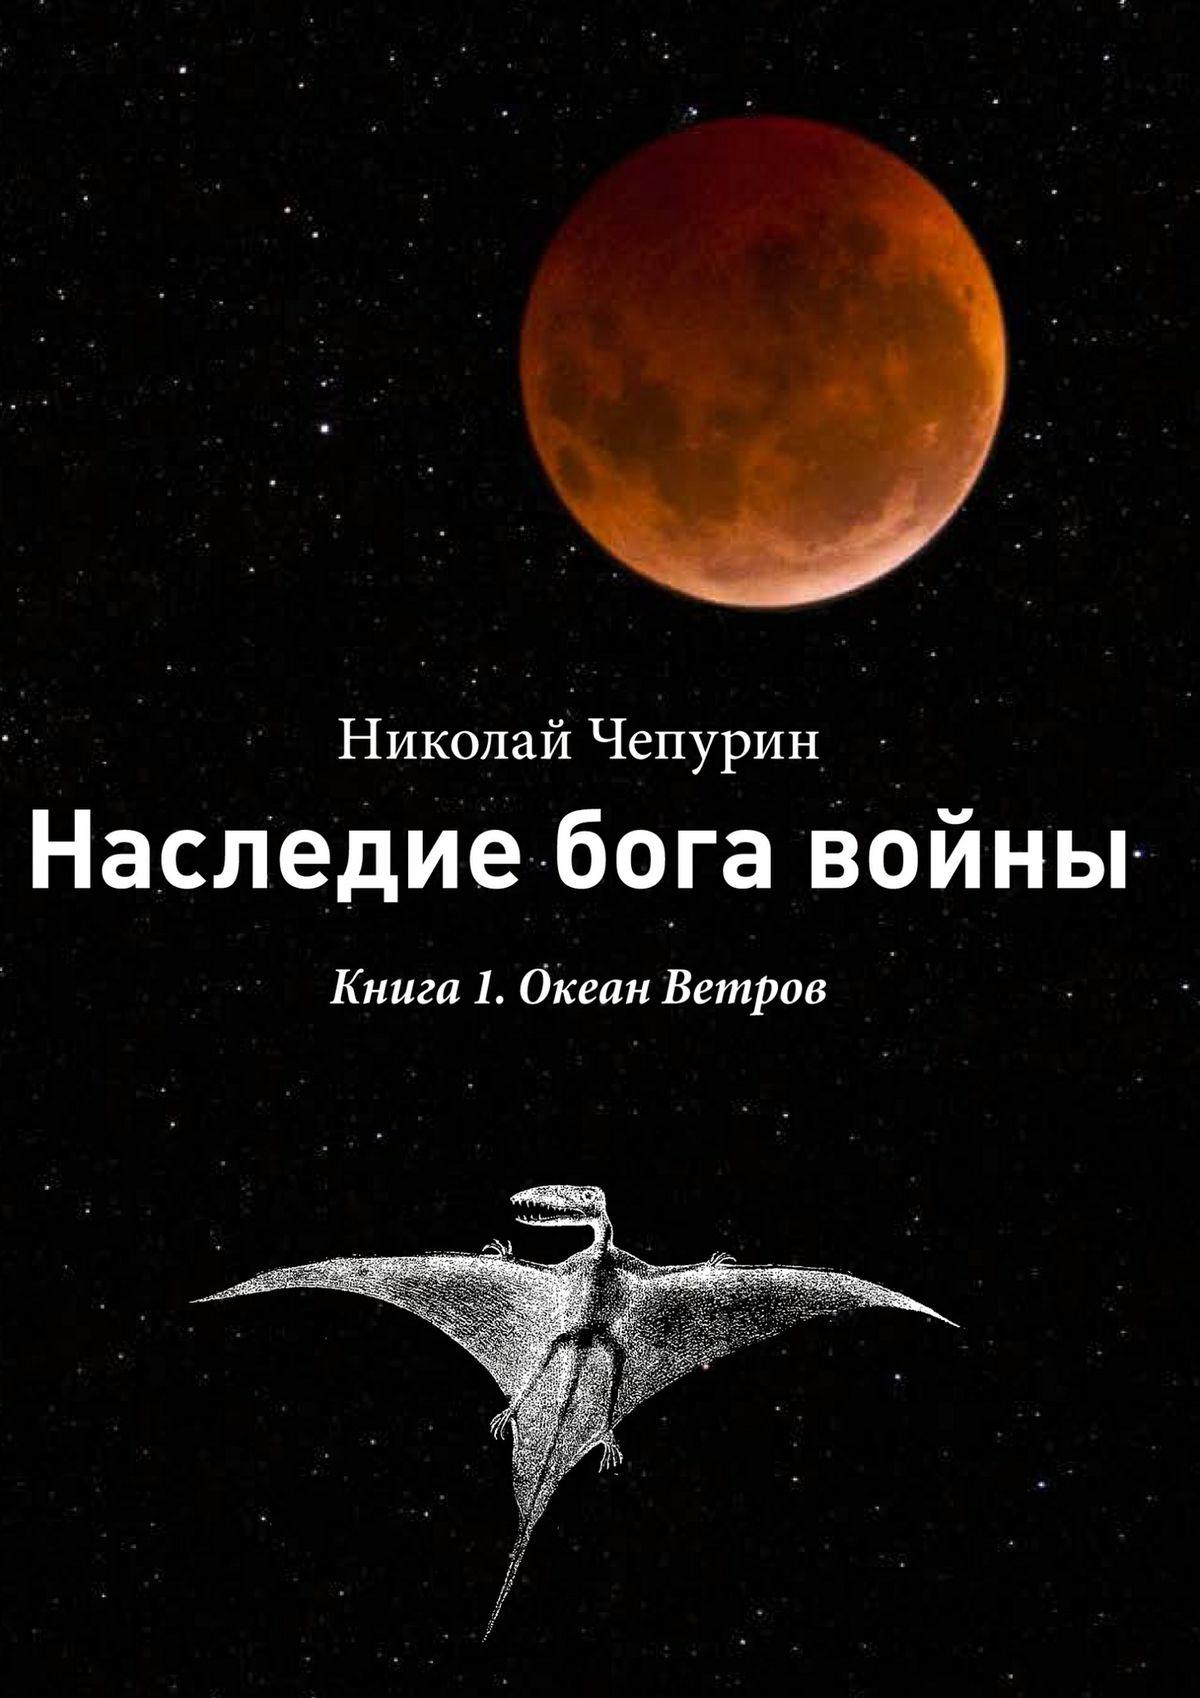 Николай Чепурин Океан Ветров